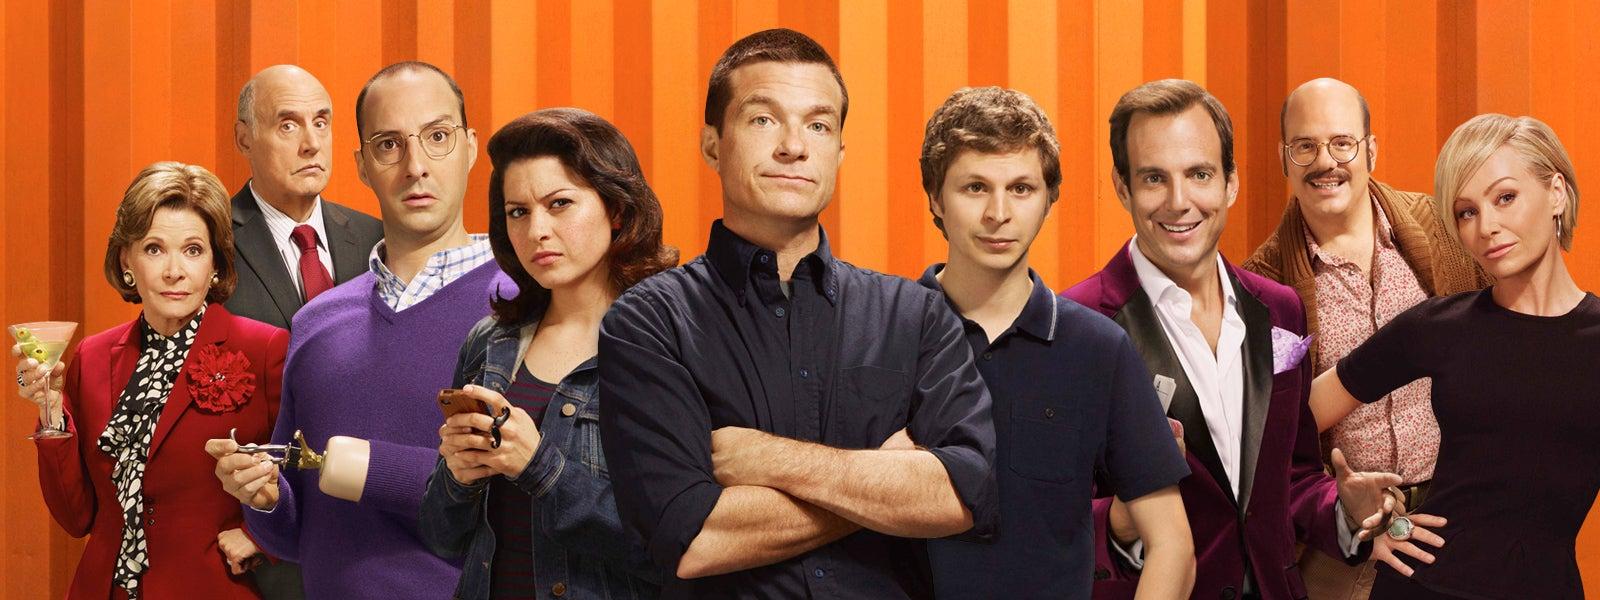 Arrested Development Getting 17 More Episodes On Netflix